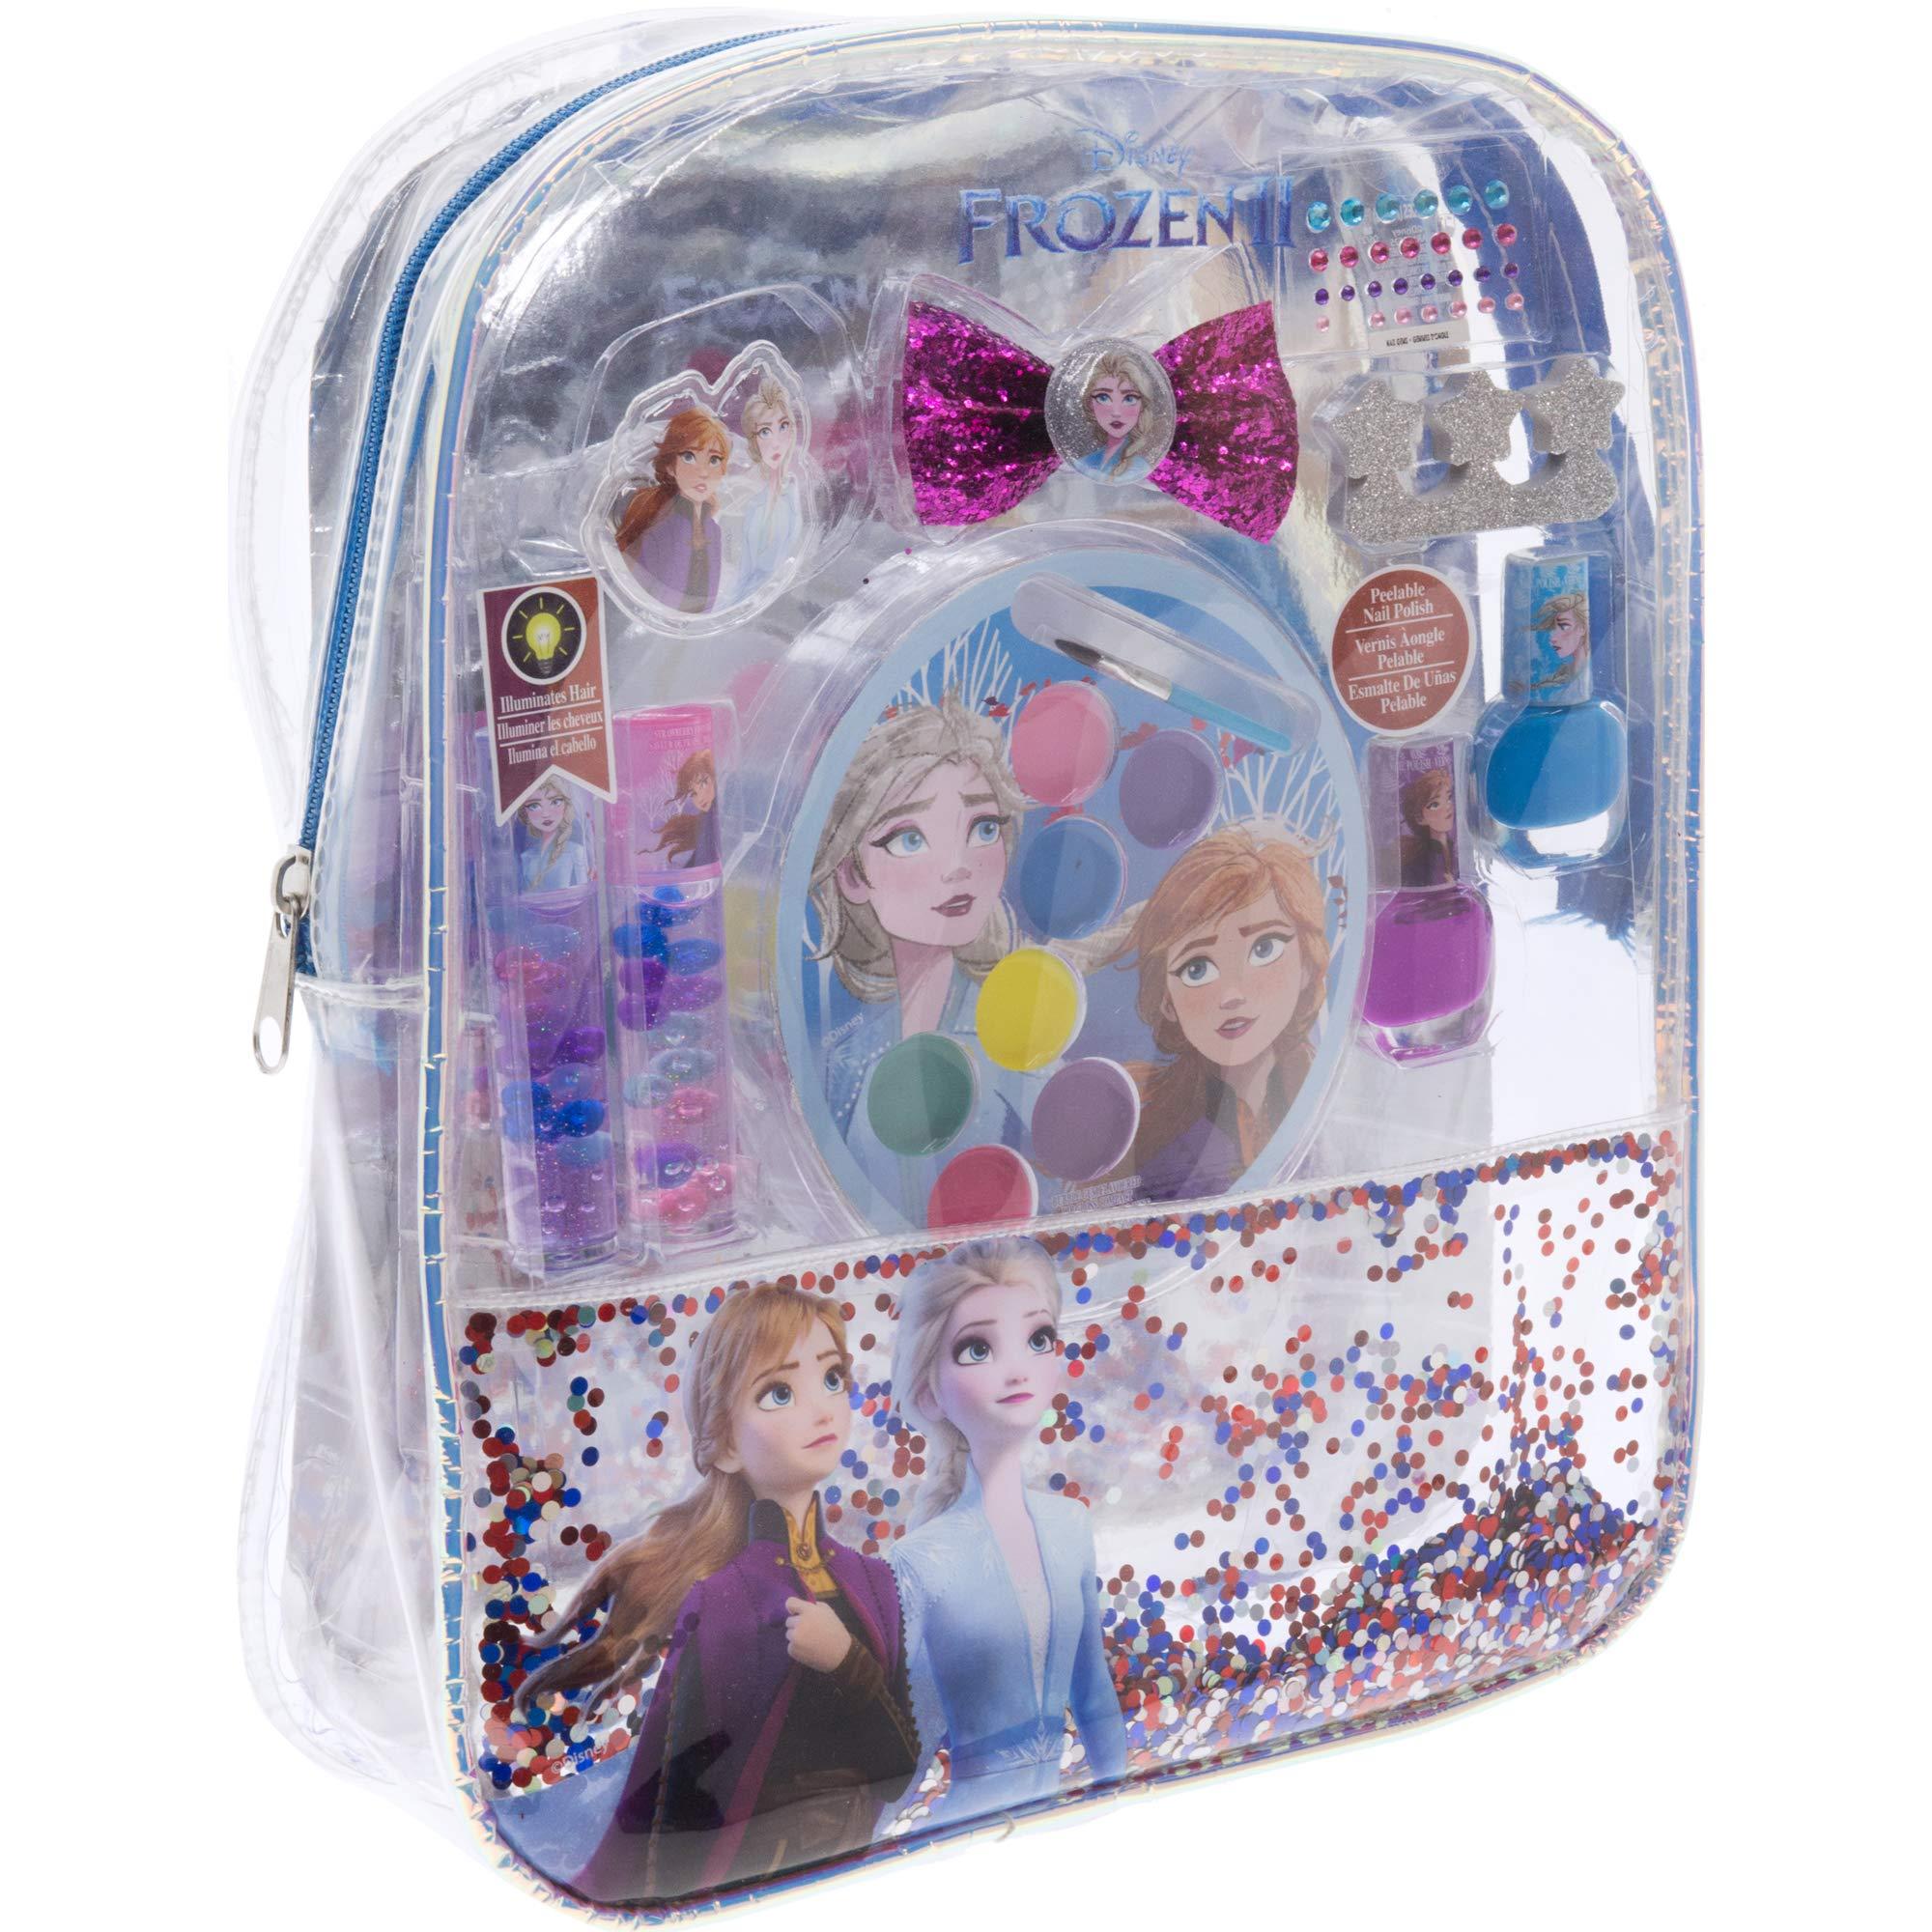 Townley Girl Disney Frozen 2 backpack Cosmetic Set, Includes: Lip Gloss Compact, Hair Bows, Nail Polish, Nail File, Lip Balm, Toe Spacer, Nail Stickers